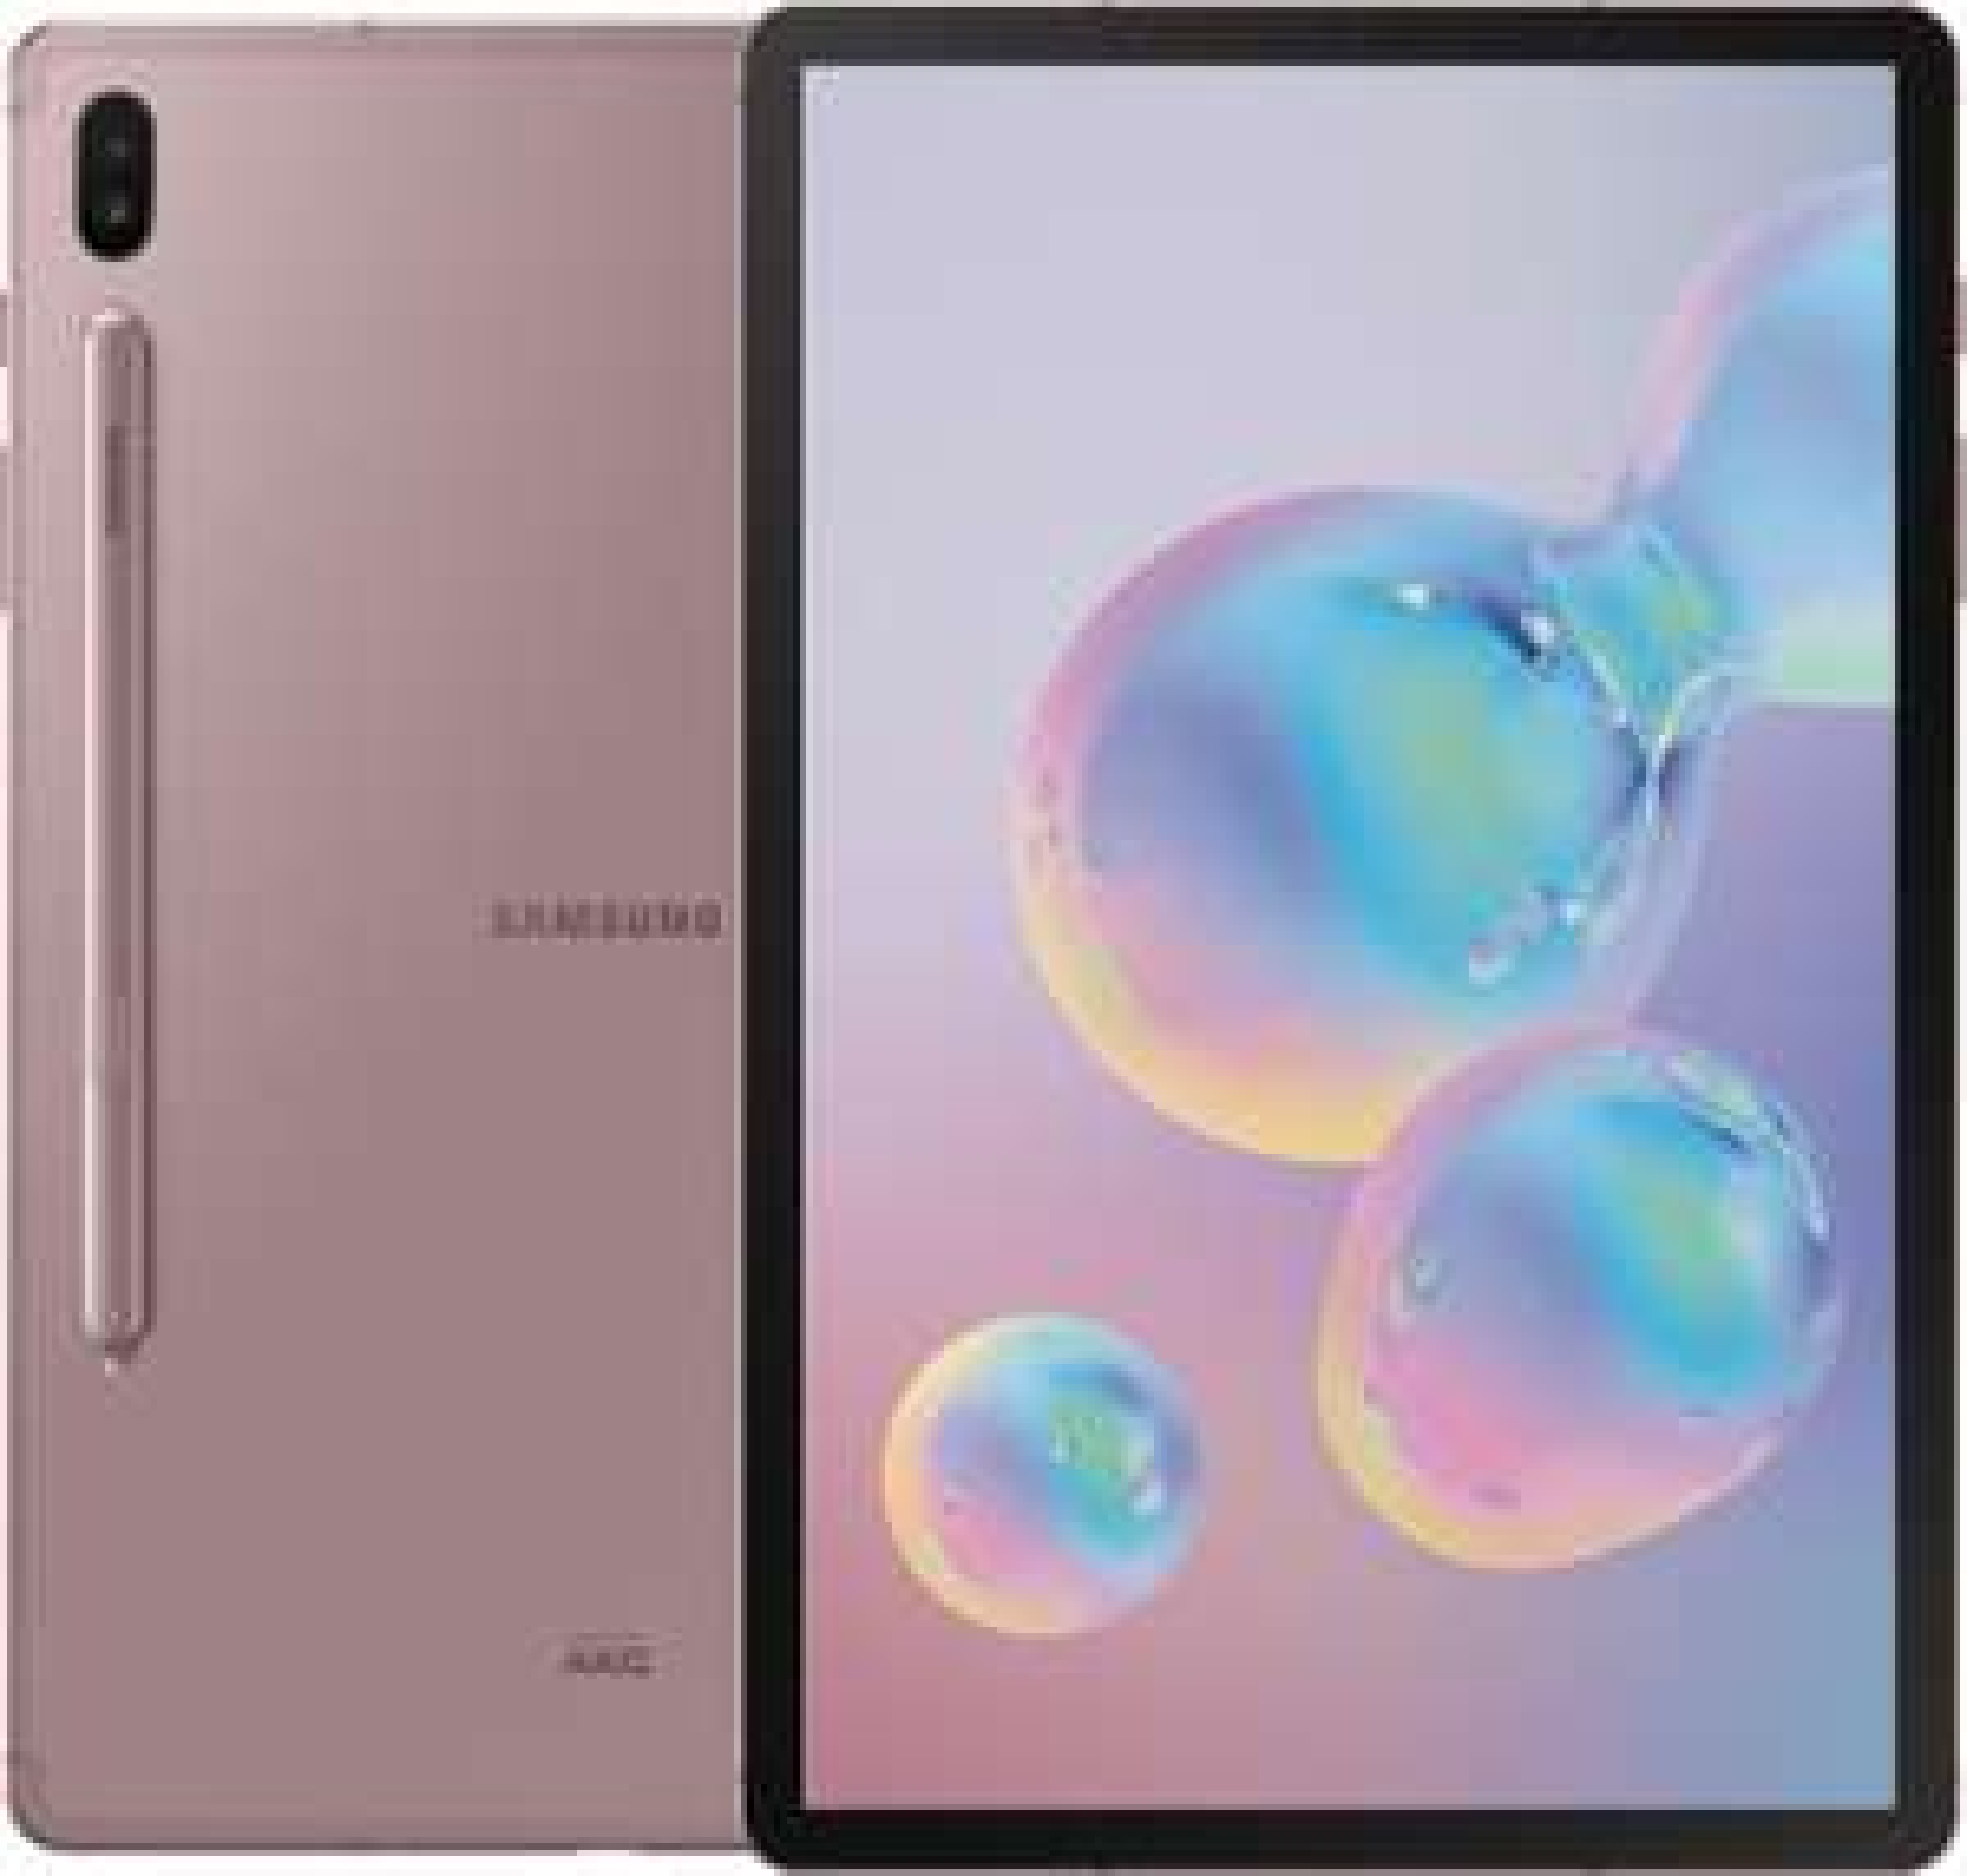 Różowy SAMSUNG Galaxy Tab S6 10.5 LTE @MediaExpert